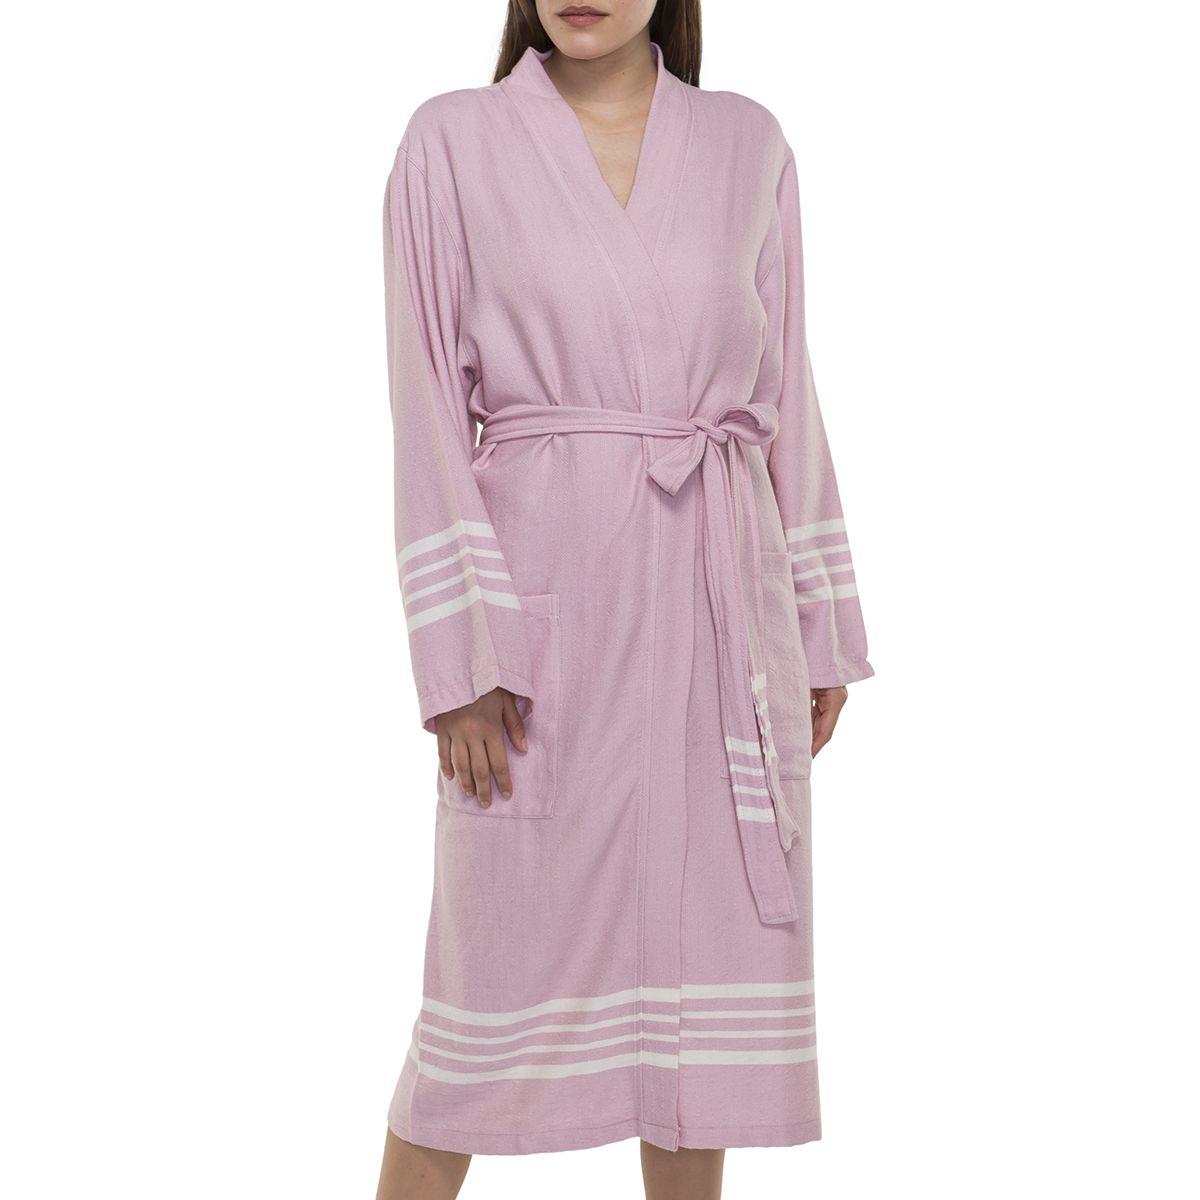 Bathrobe Sultan Kimono - Rose Pink